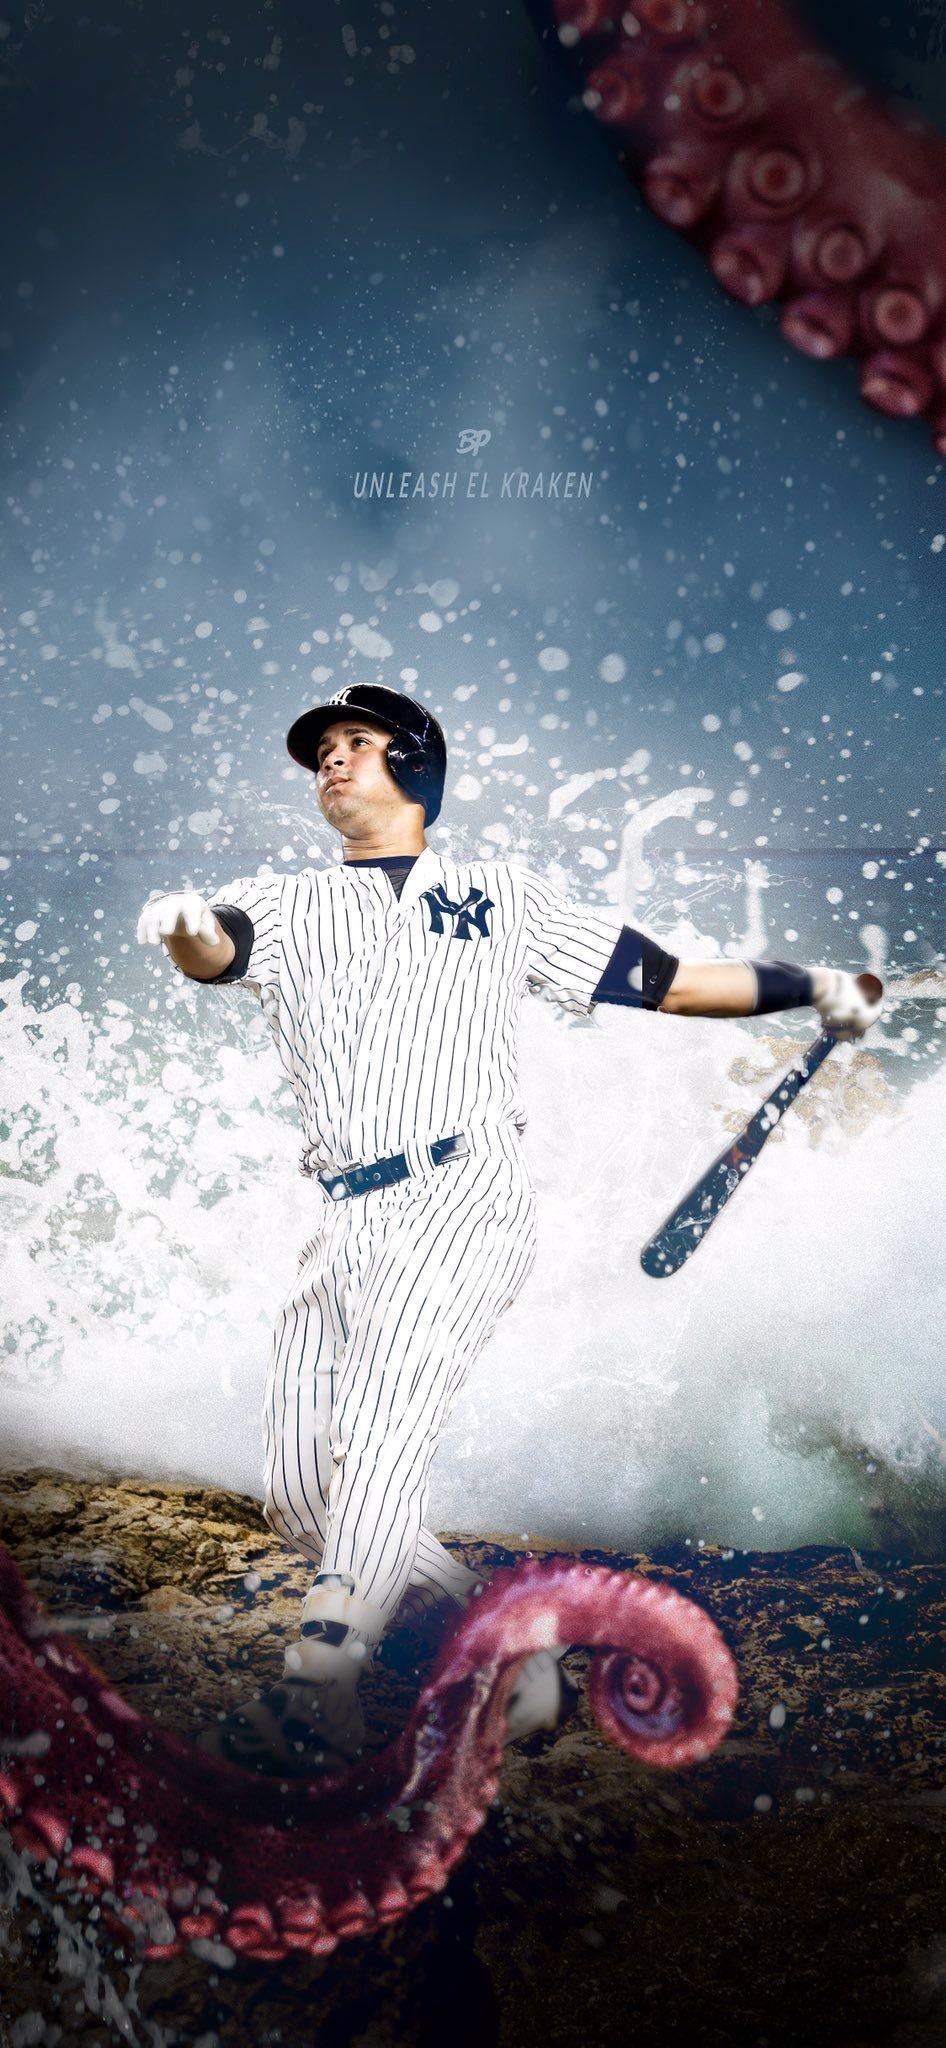 El gary new york yankees ny yankees yankees baseball